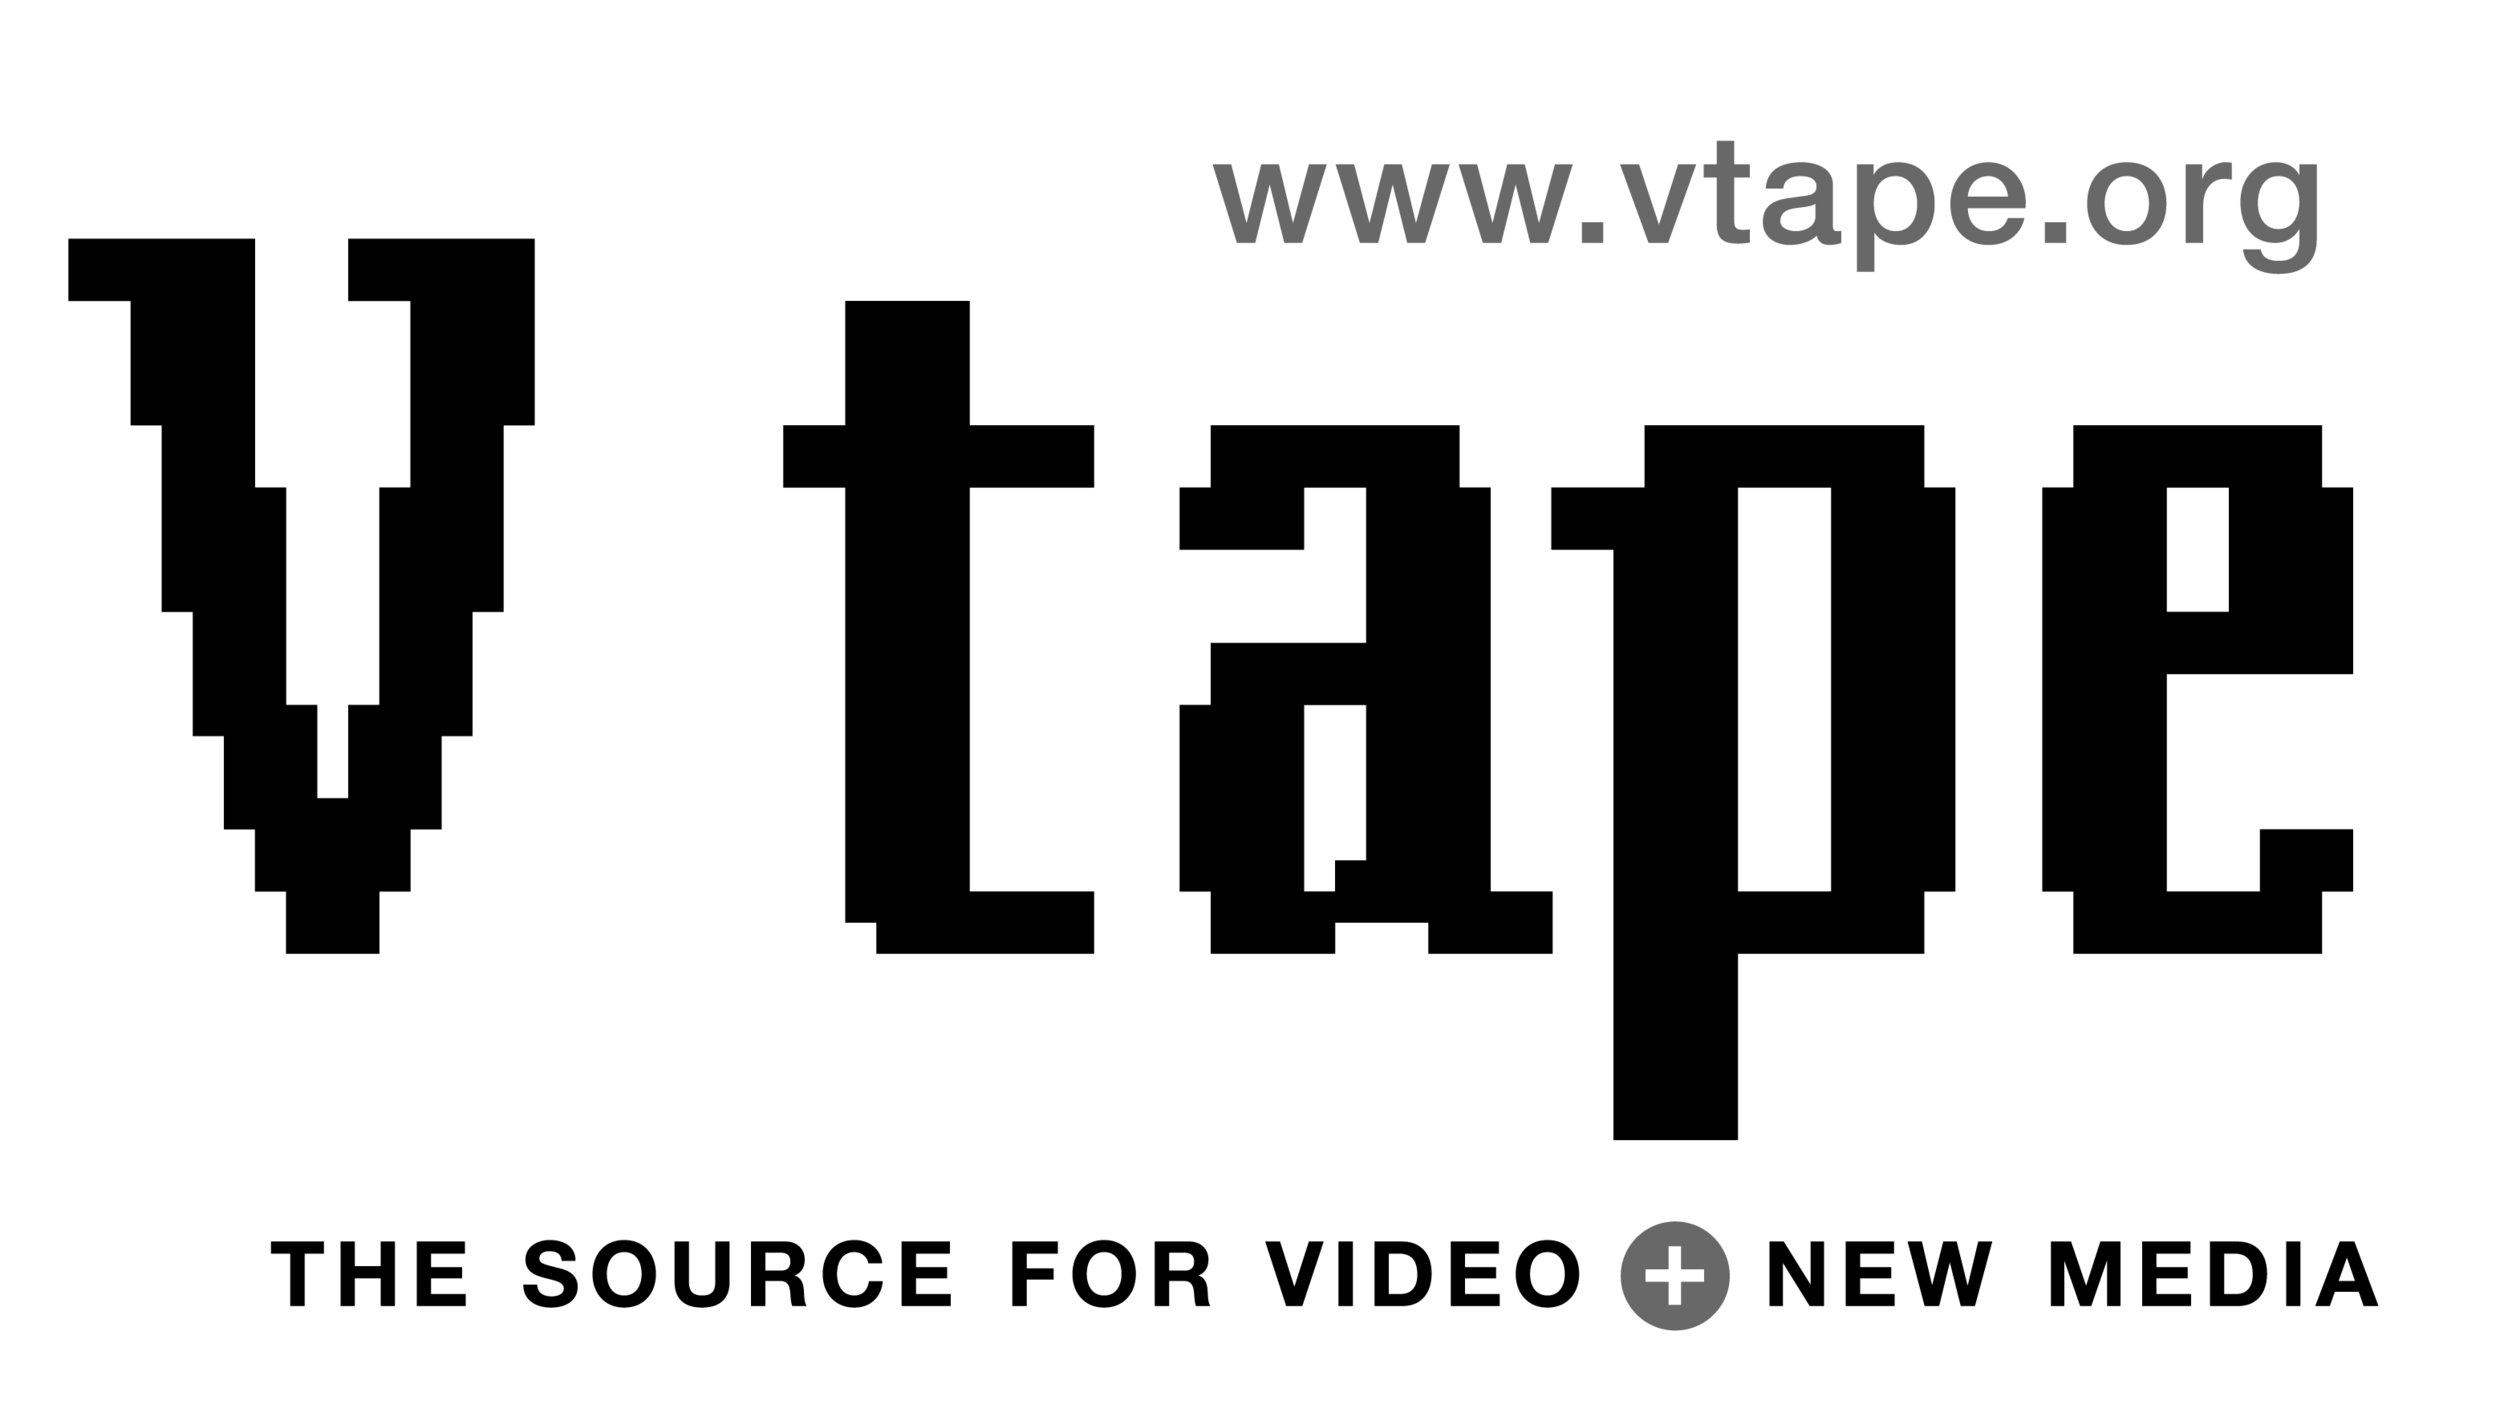 vtape_thesource_web.jpg